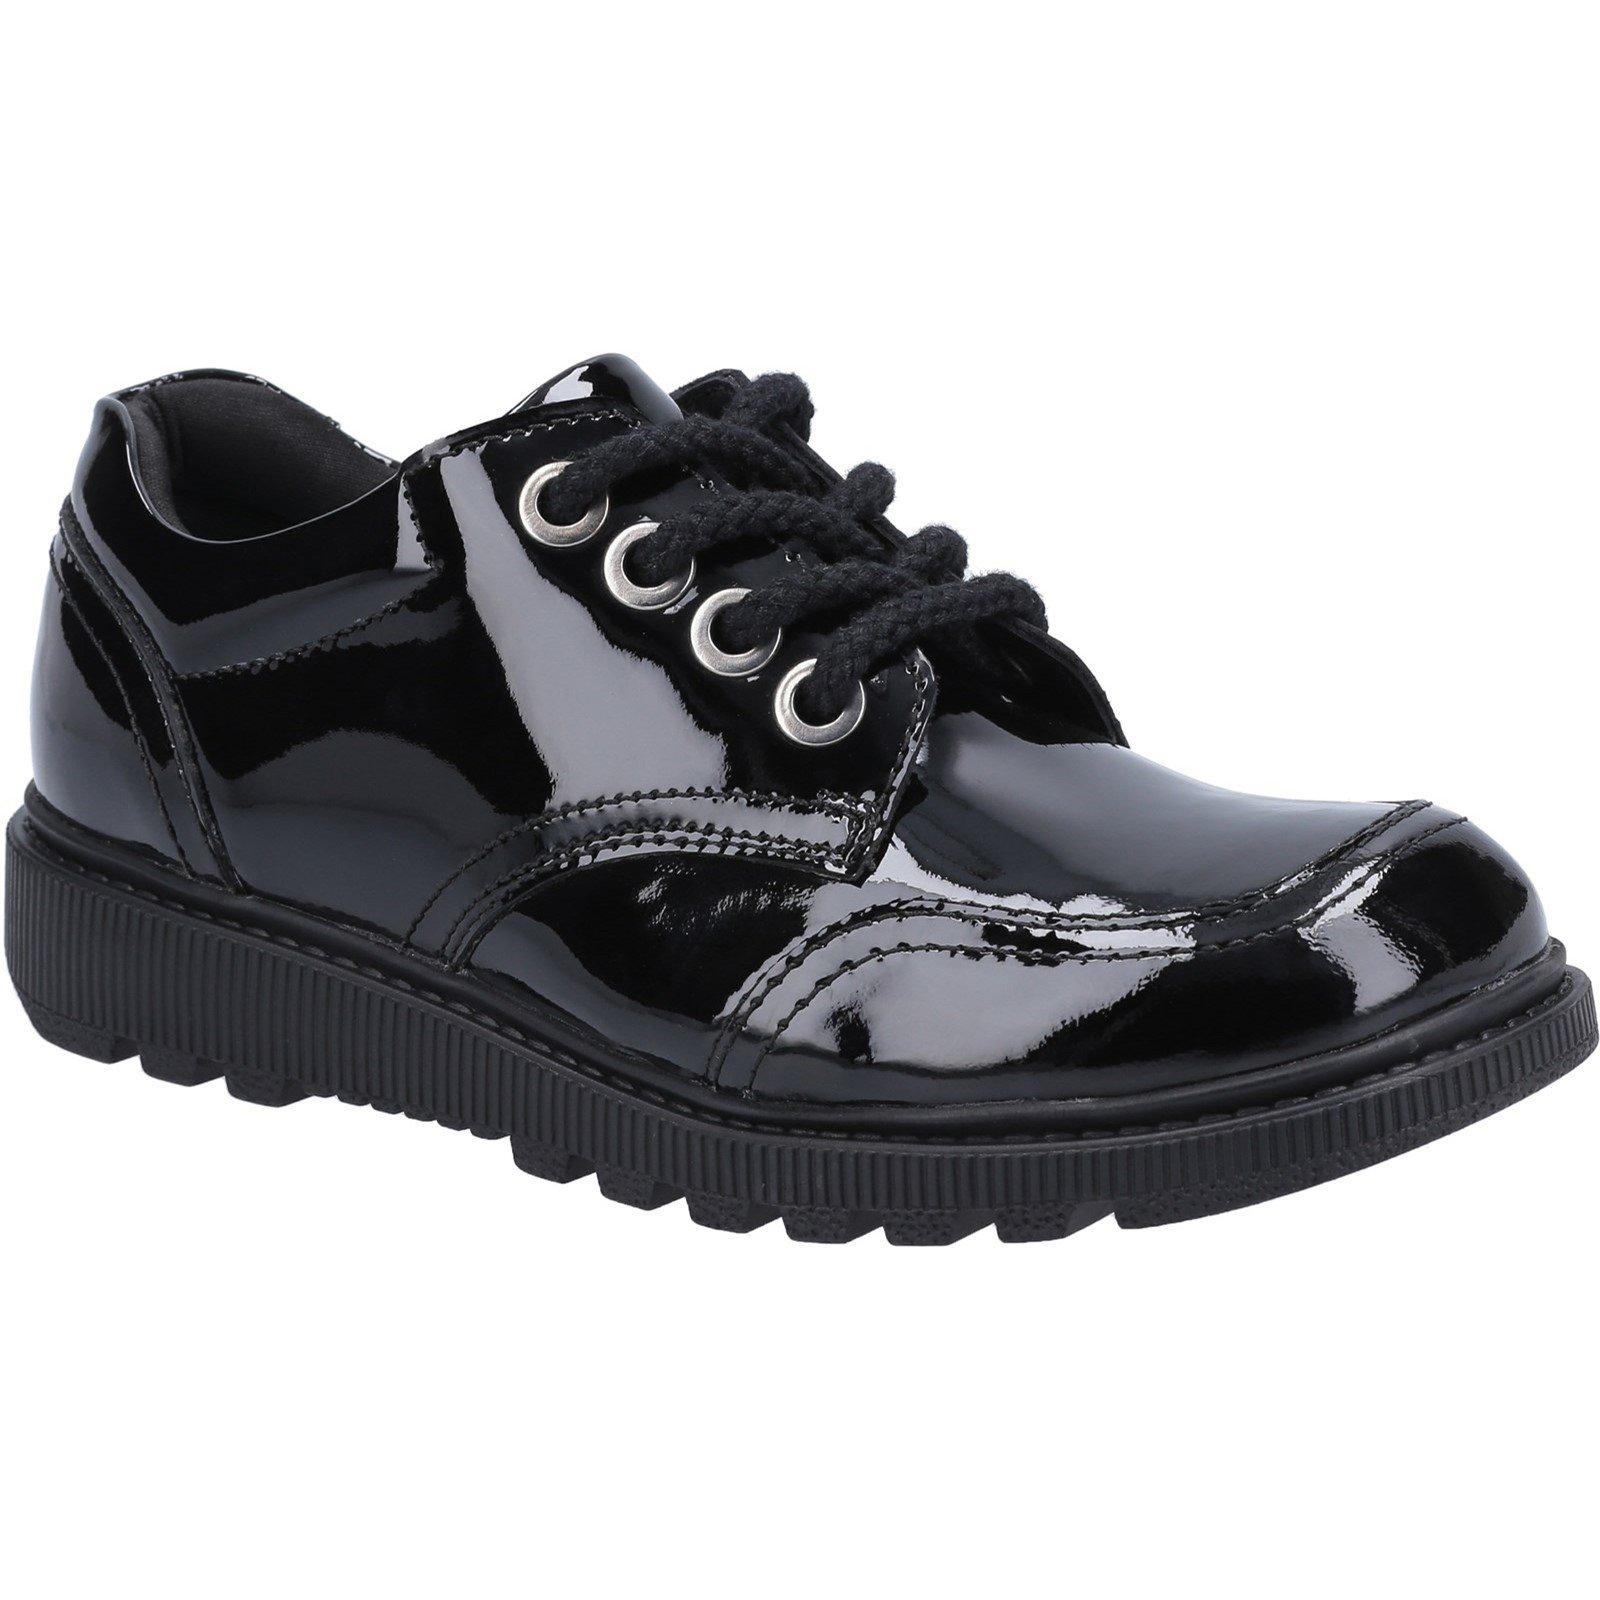 Hush Puppies Kid's Kiera Senior Patent School Shoe Black 30824 - Patent Black 6